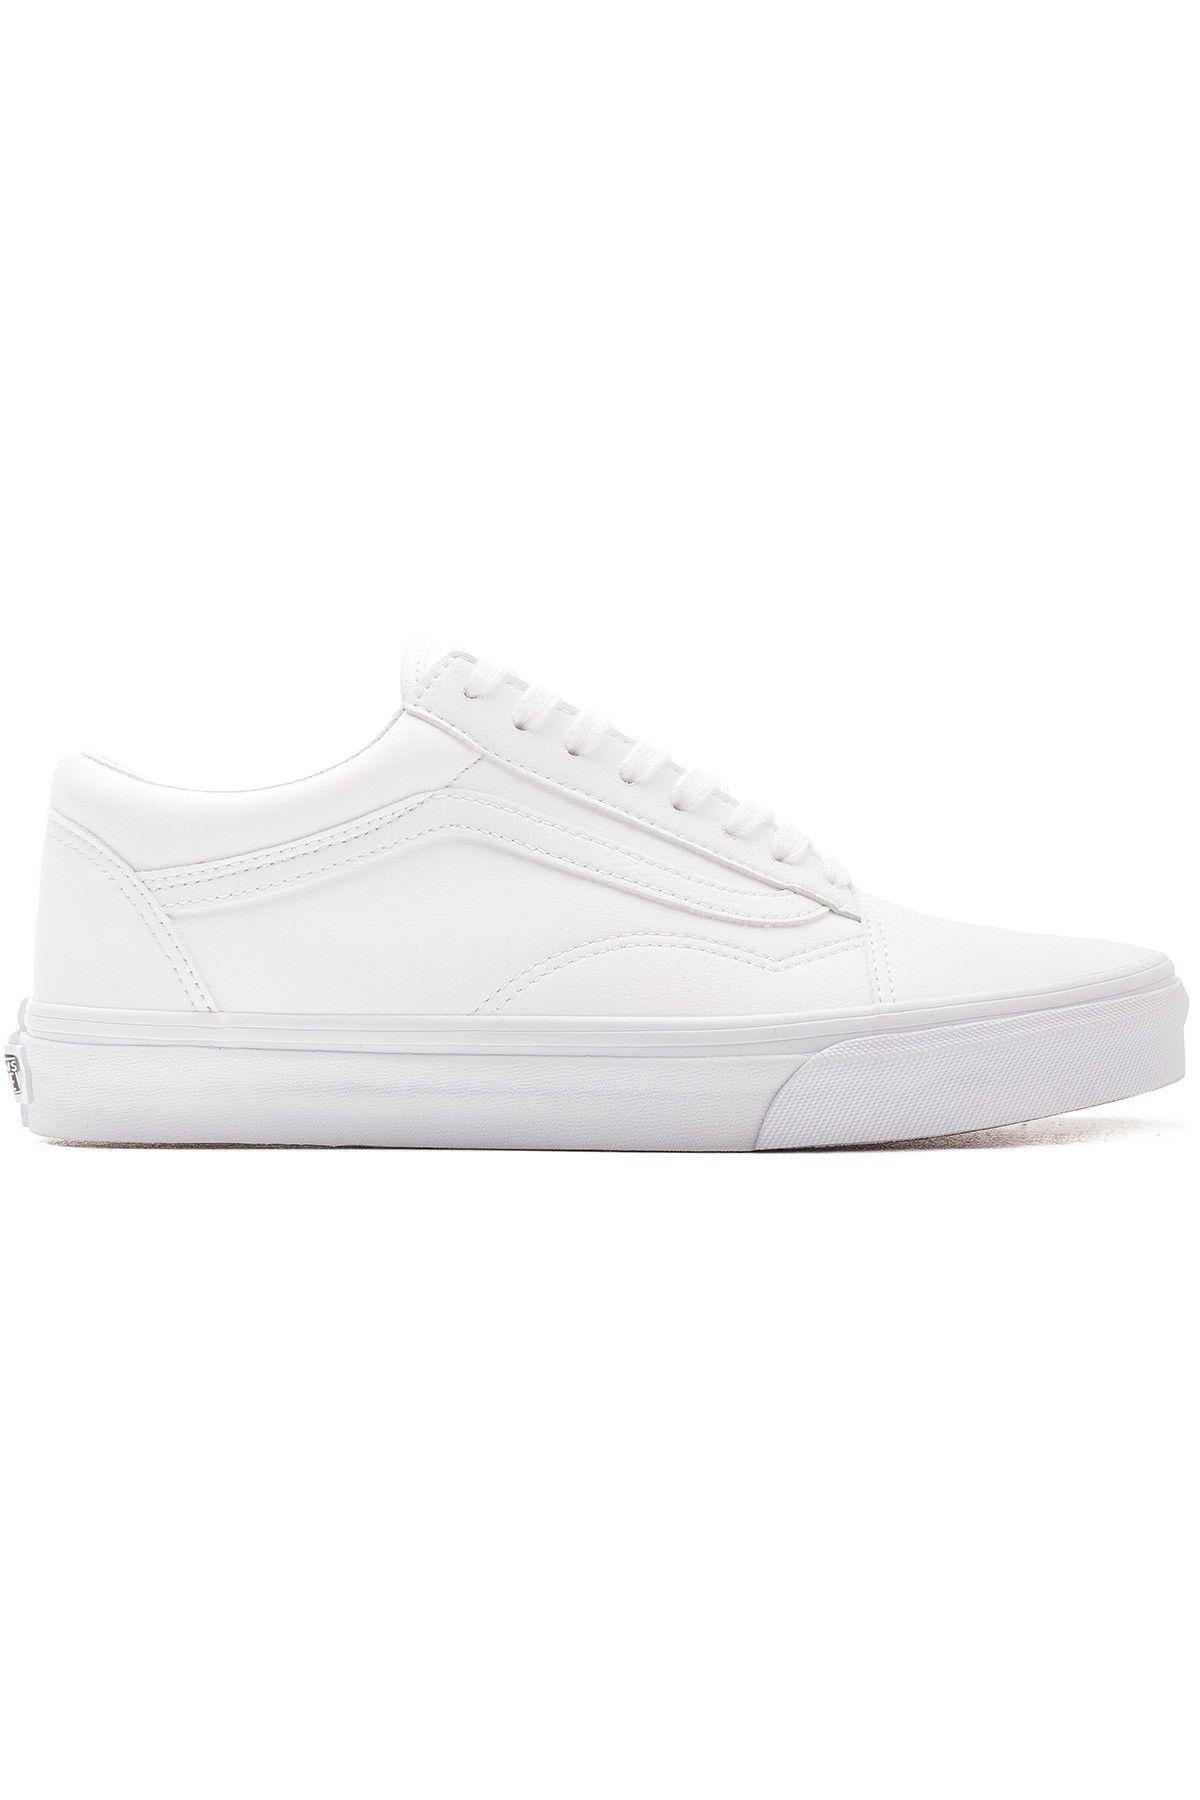 tumbled leather vans white